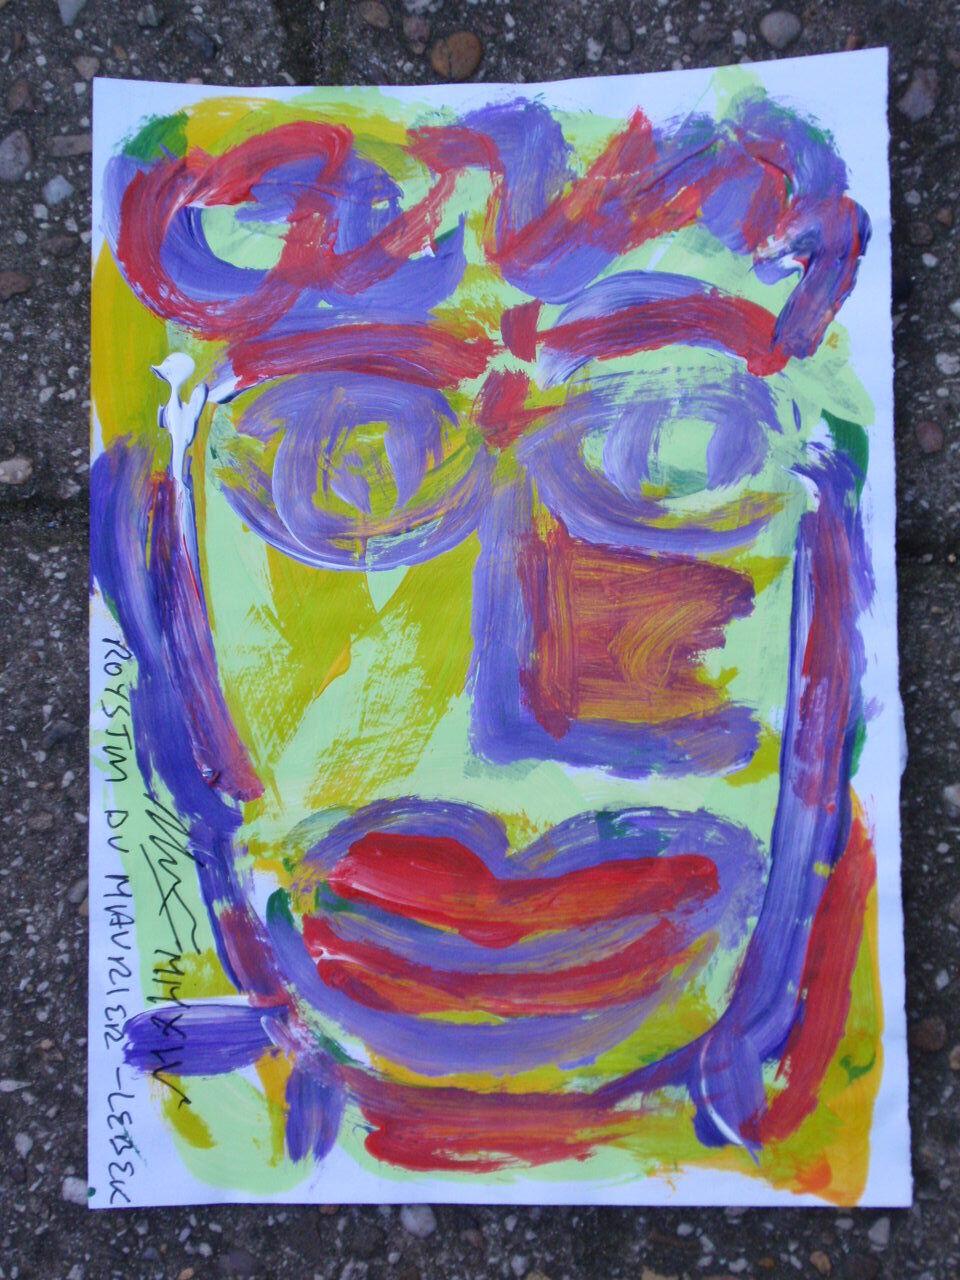 ROYSTON DU MAURIER-LEBEK Ritratto originale firmato dipinto acrilico acrilico acrilico su carta  M 7a1480